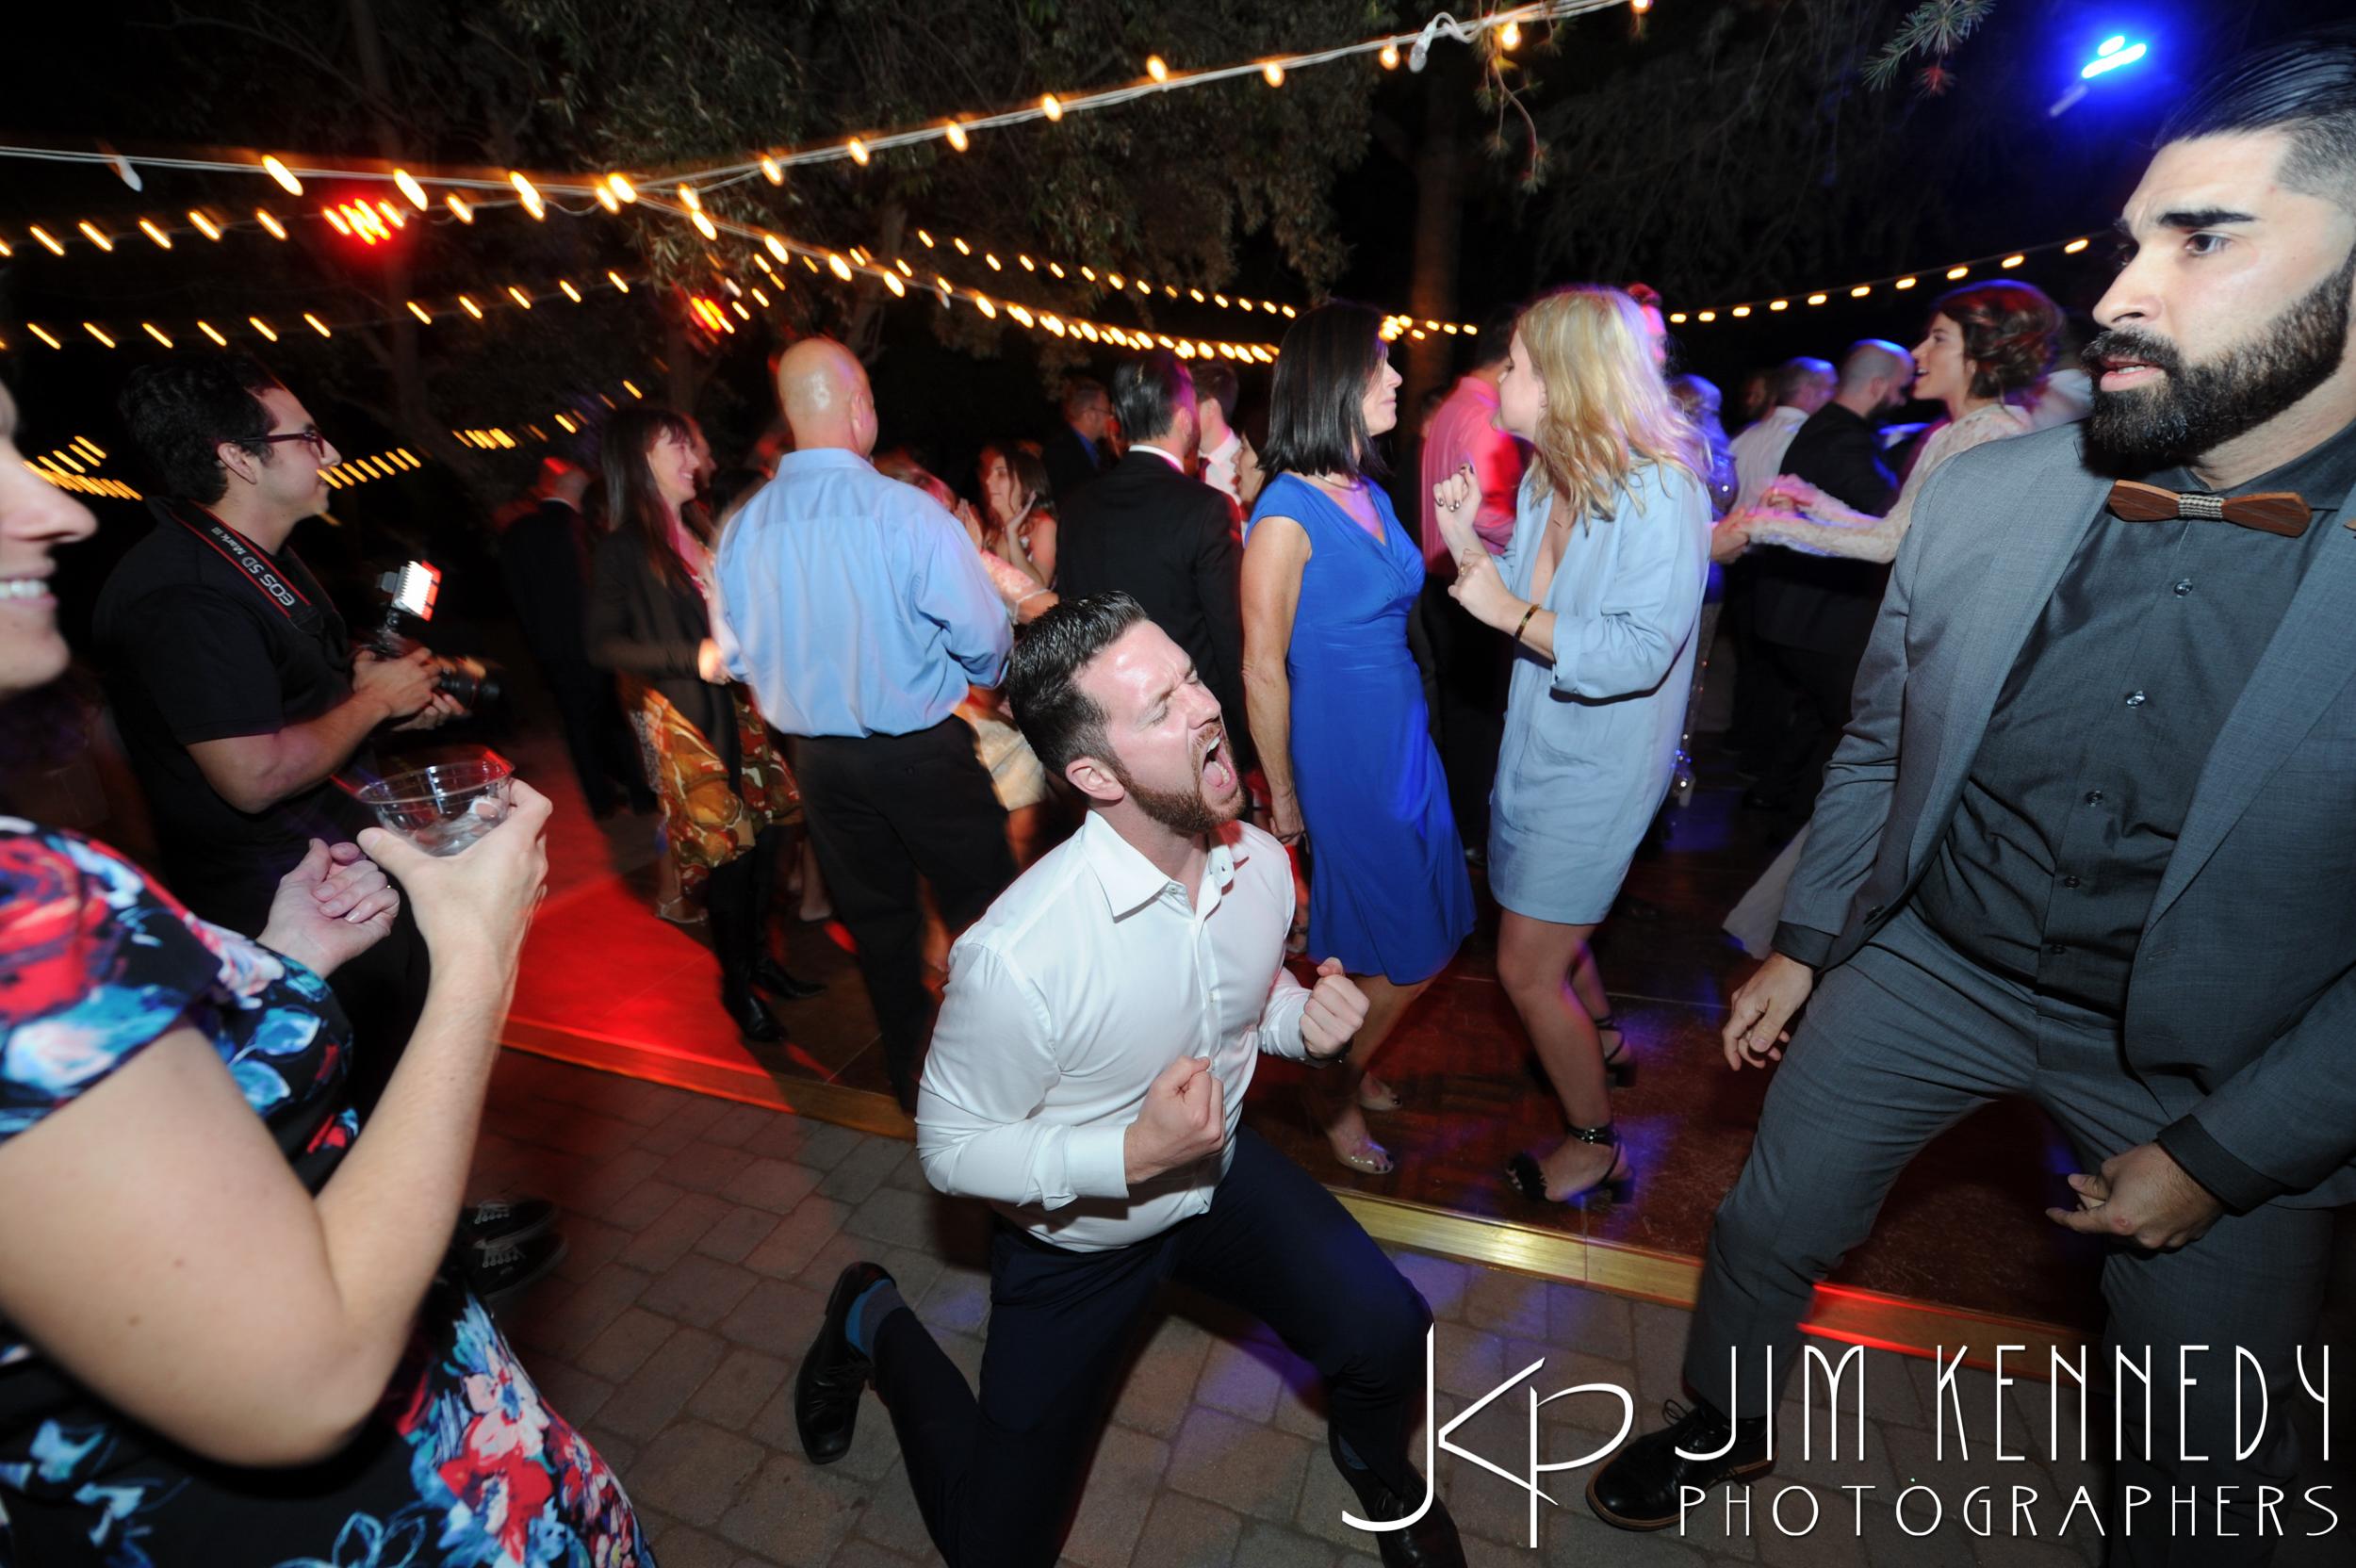 jim_kennedy_photographers_highland_springs_wedding_caitlyn_0213.jpg